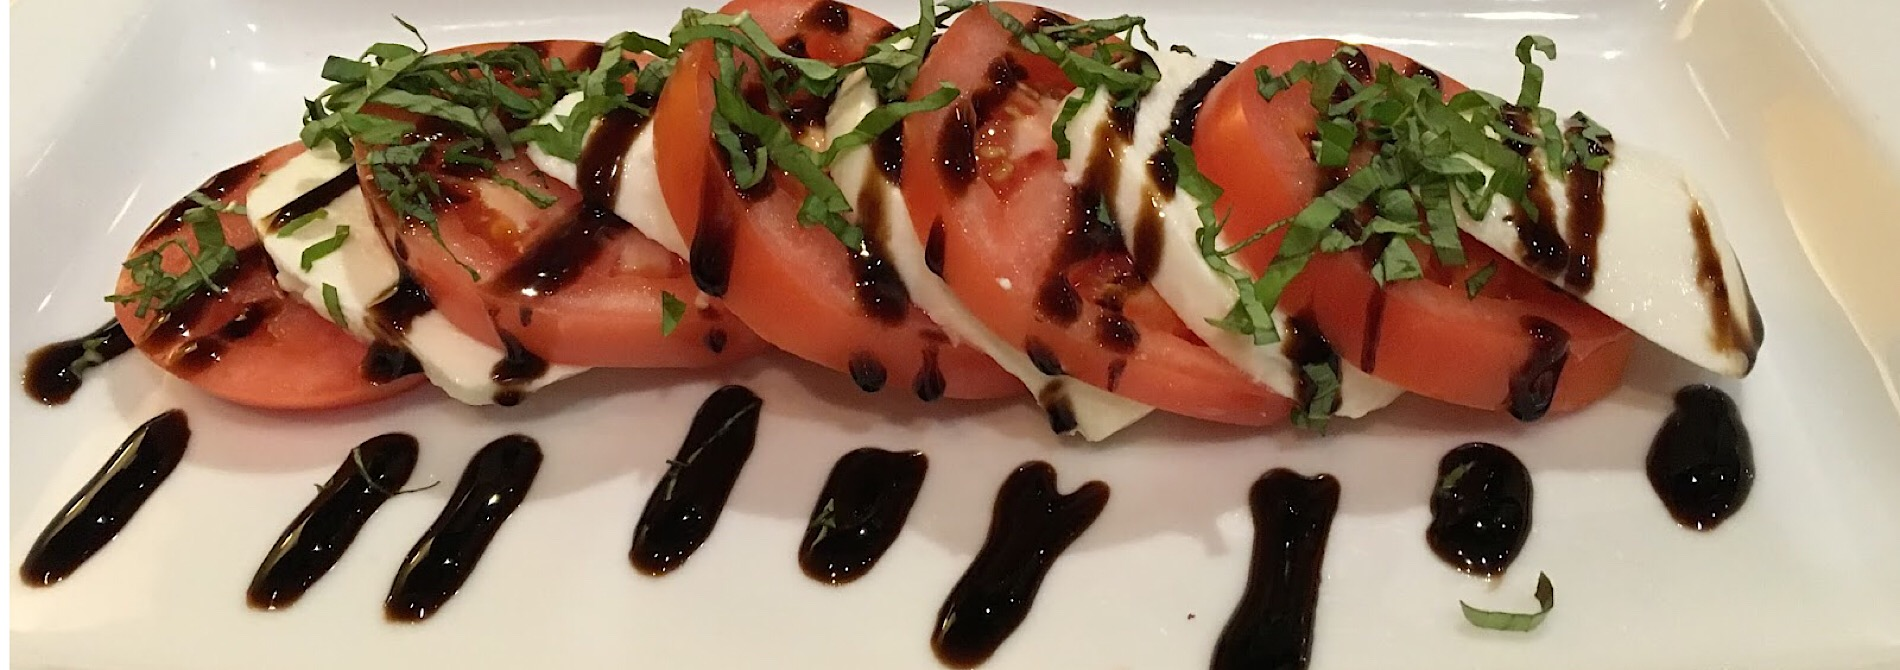 red tomato salad with white mozzarella cheese and balsamic vinegar